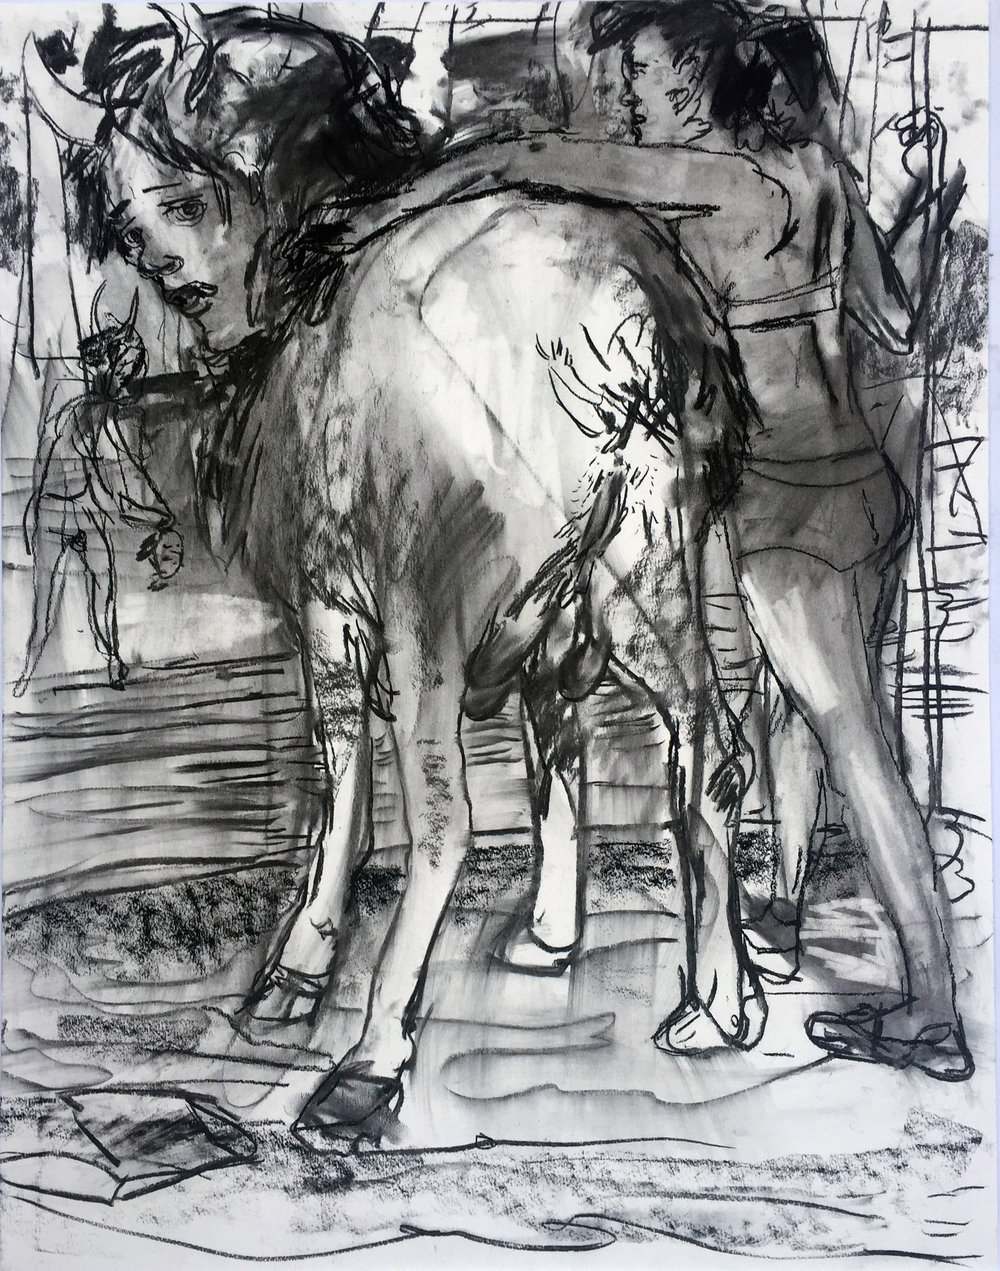 Horny Goat Lady